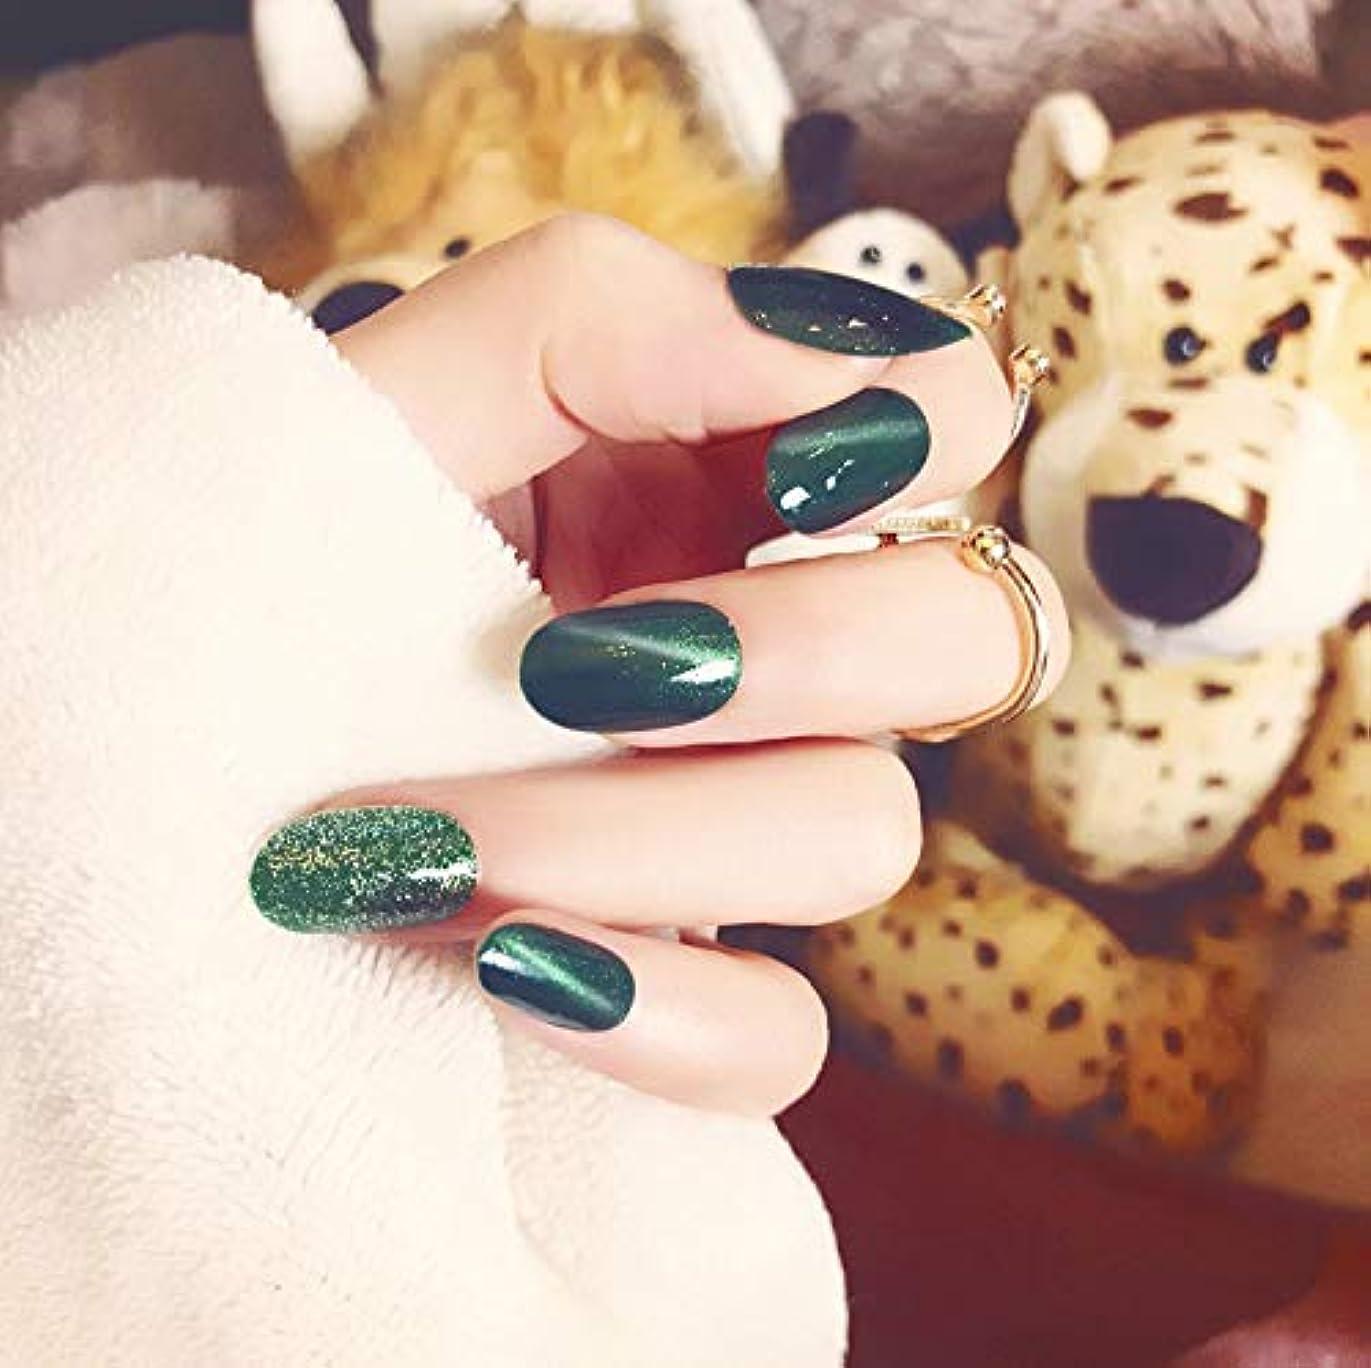 ins人気のある 24個入り ネイルチップ ジェルネイルの光疗法 無地ネイルチップ 猫目石 手作りネイルアートチップ (グリーン)